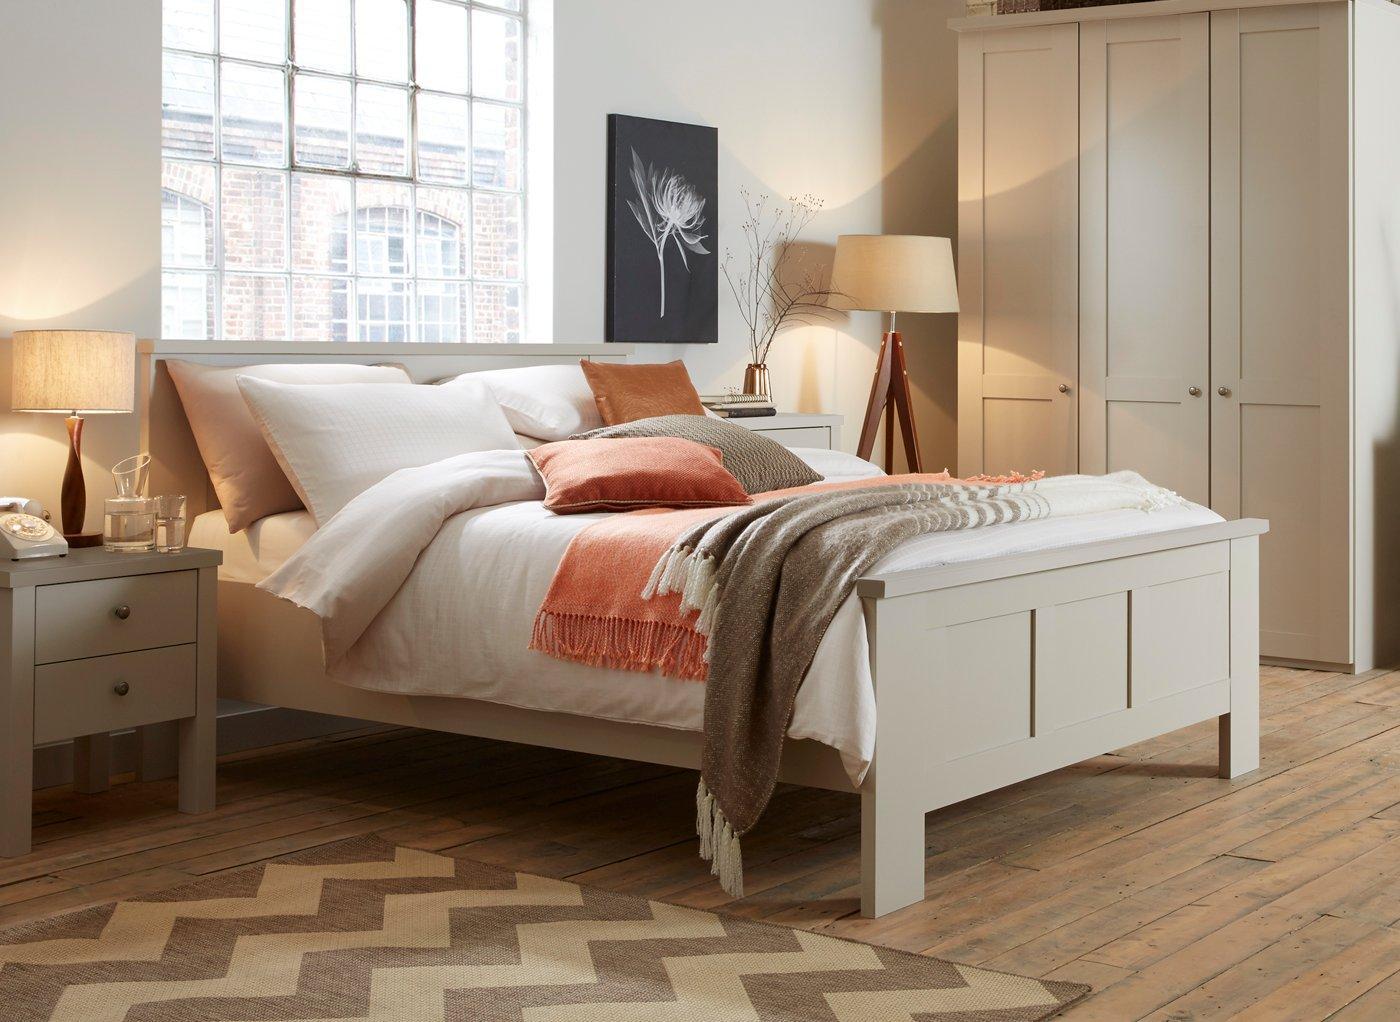 sloane-bed-frame